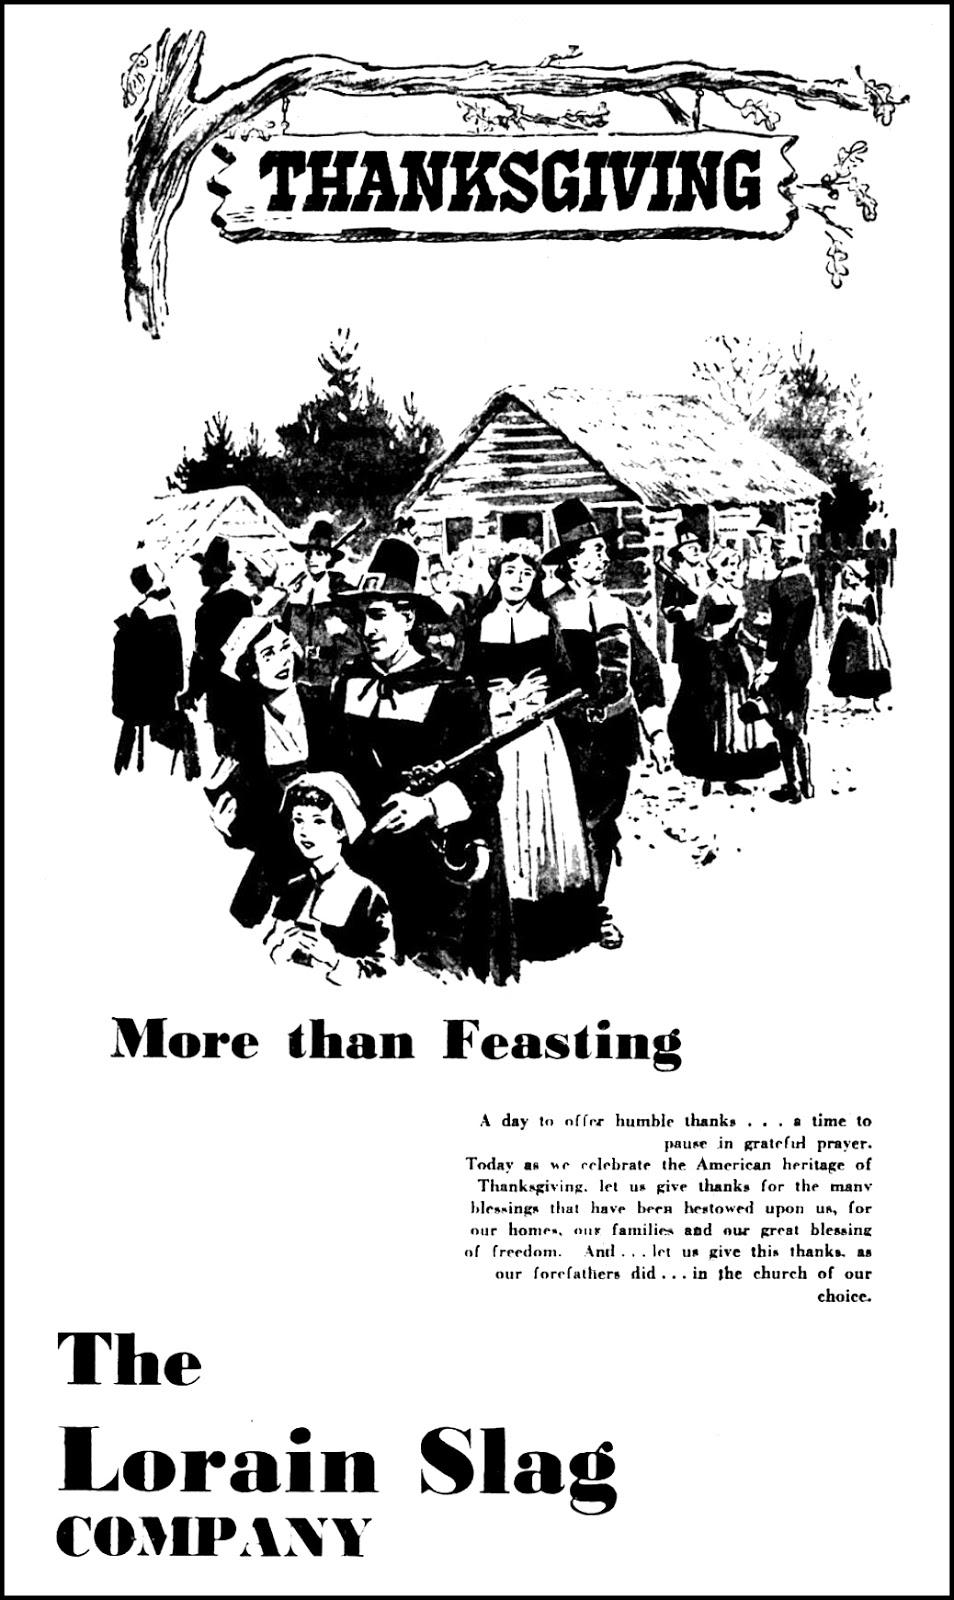 The Lorain Slag Company - published in the Lorain Journal - Lorain, Ohio U.S.A. - November 28, 1957